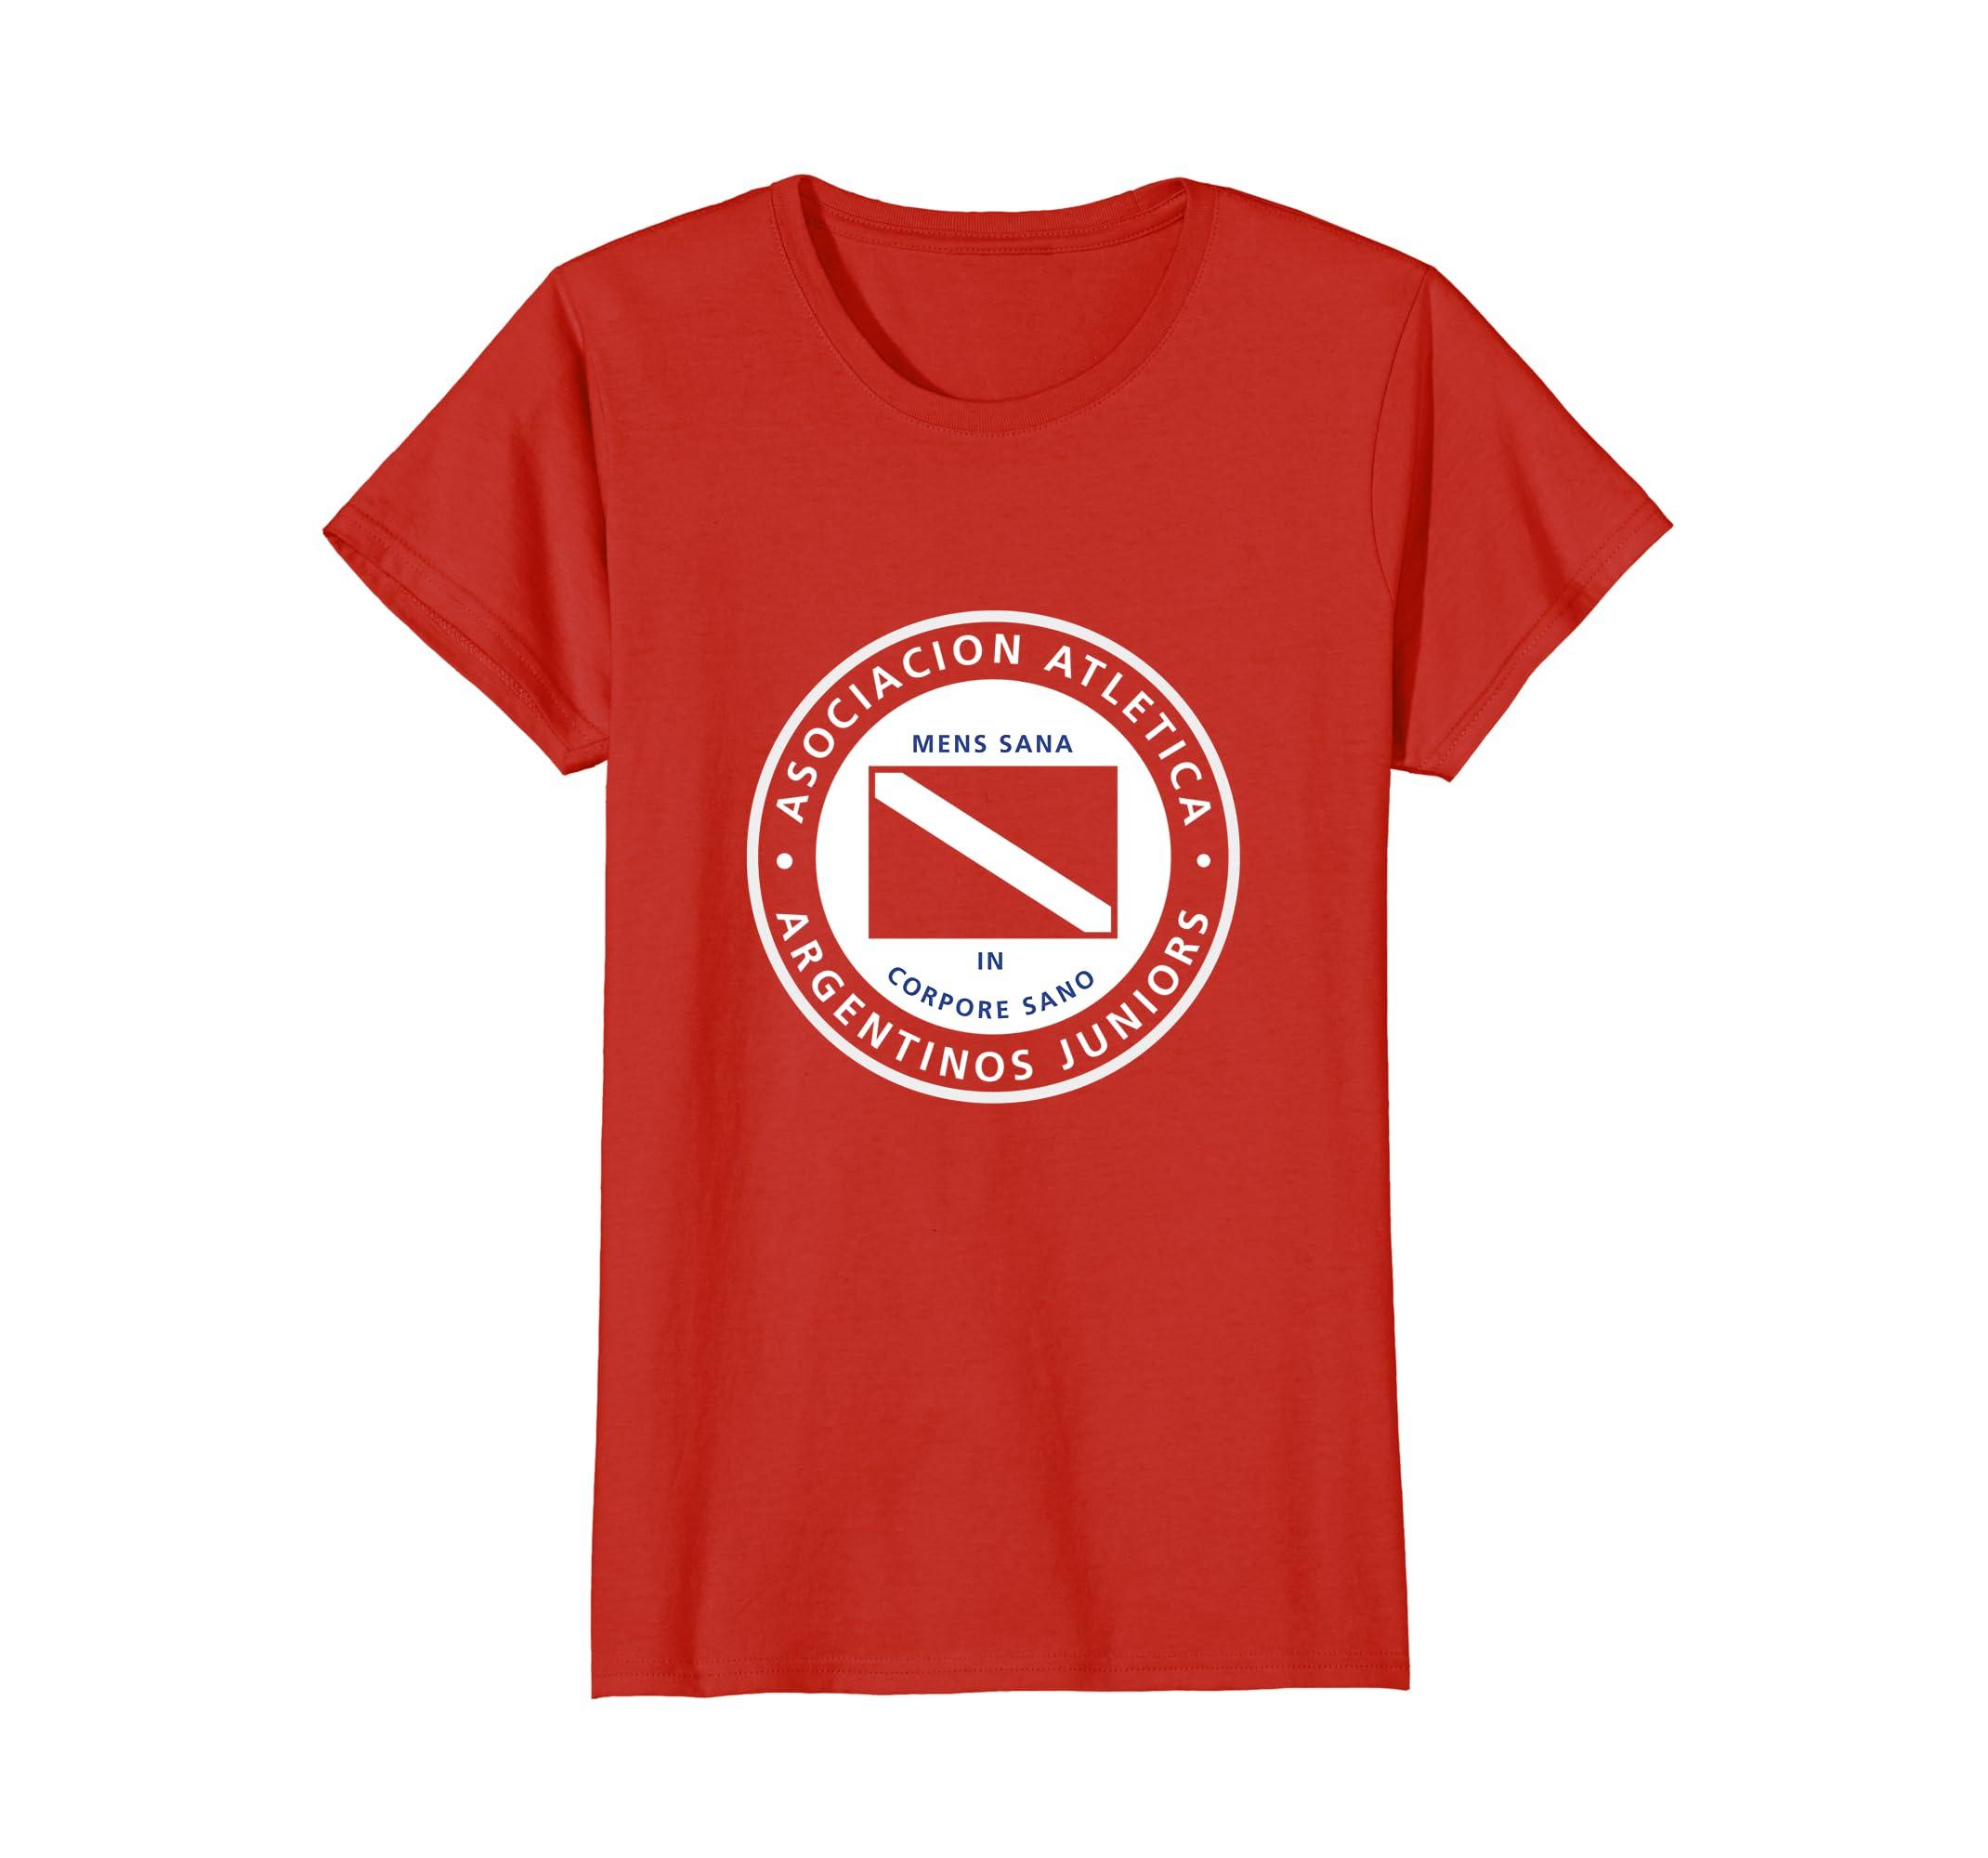 Amazon.com: A.A.A.J. Argentino Juniors Argentina Camiseta TShirt Jersey: Clothing